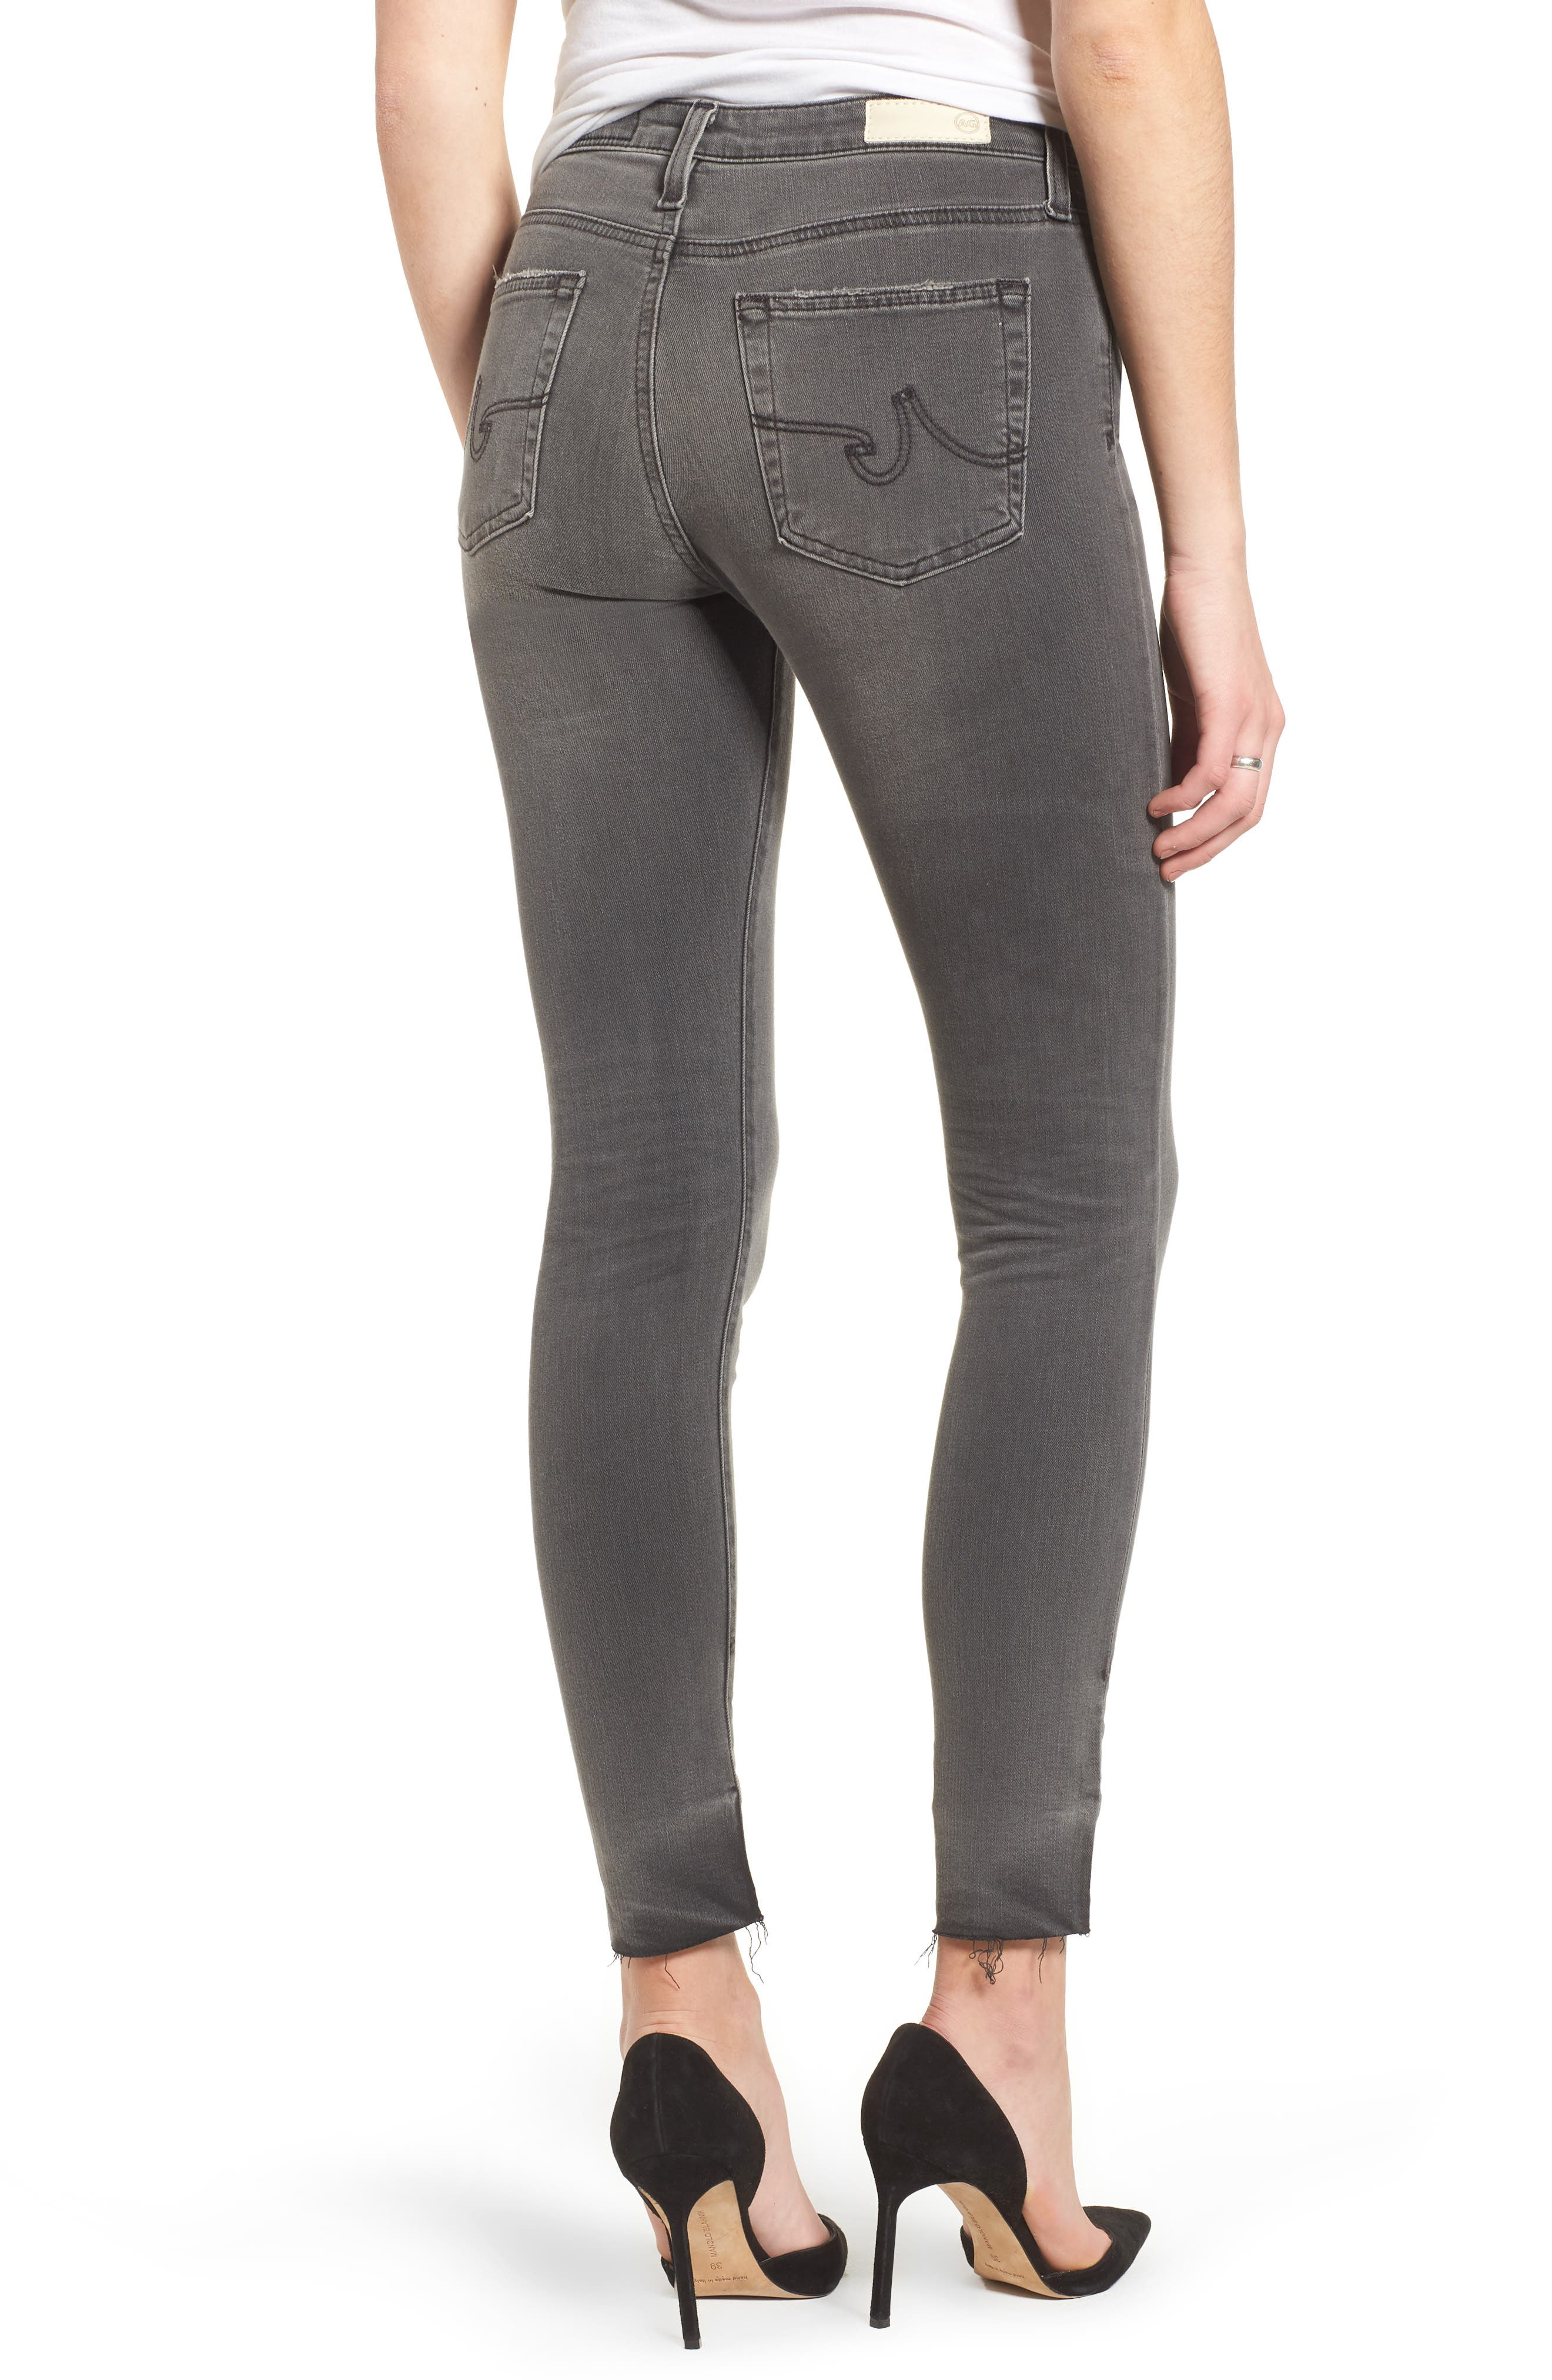 The Farrah High Waist Raw Hem Skinny Jeans,                             Alternate thumbnail 2, color,                             12 YEARS-SHADOW ASH